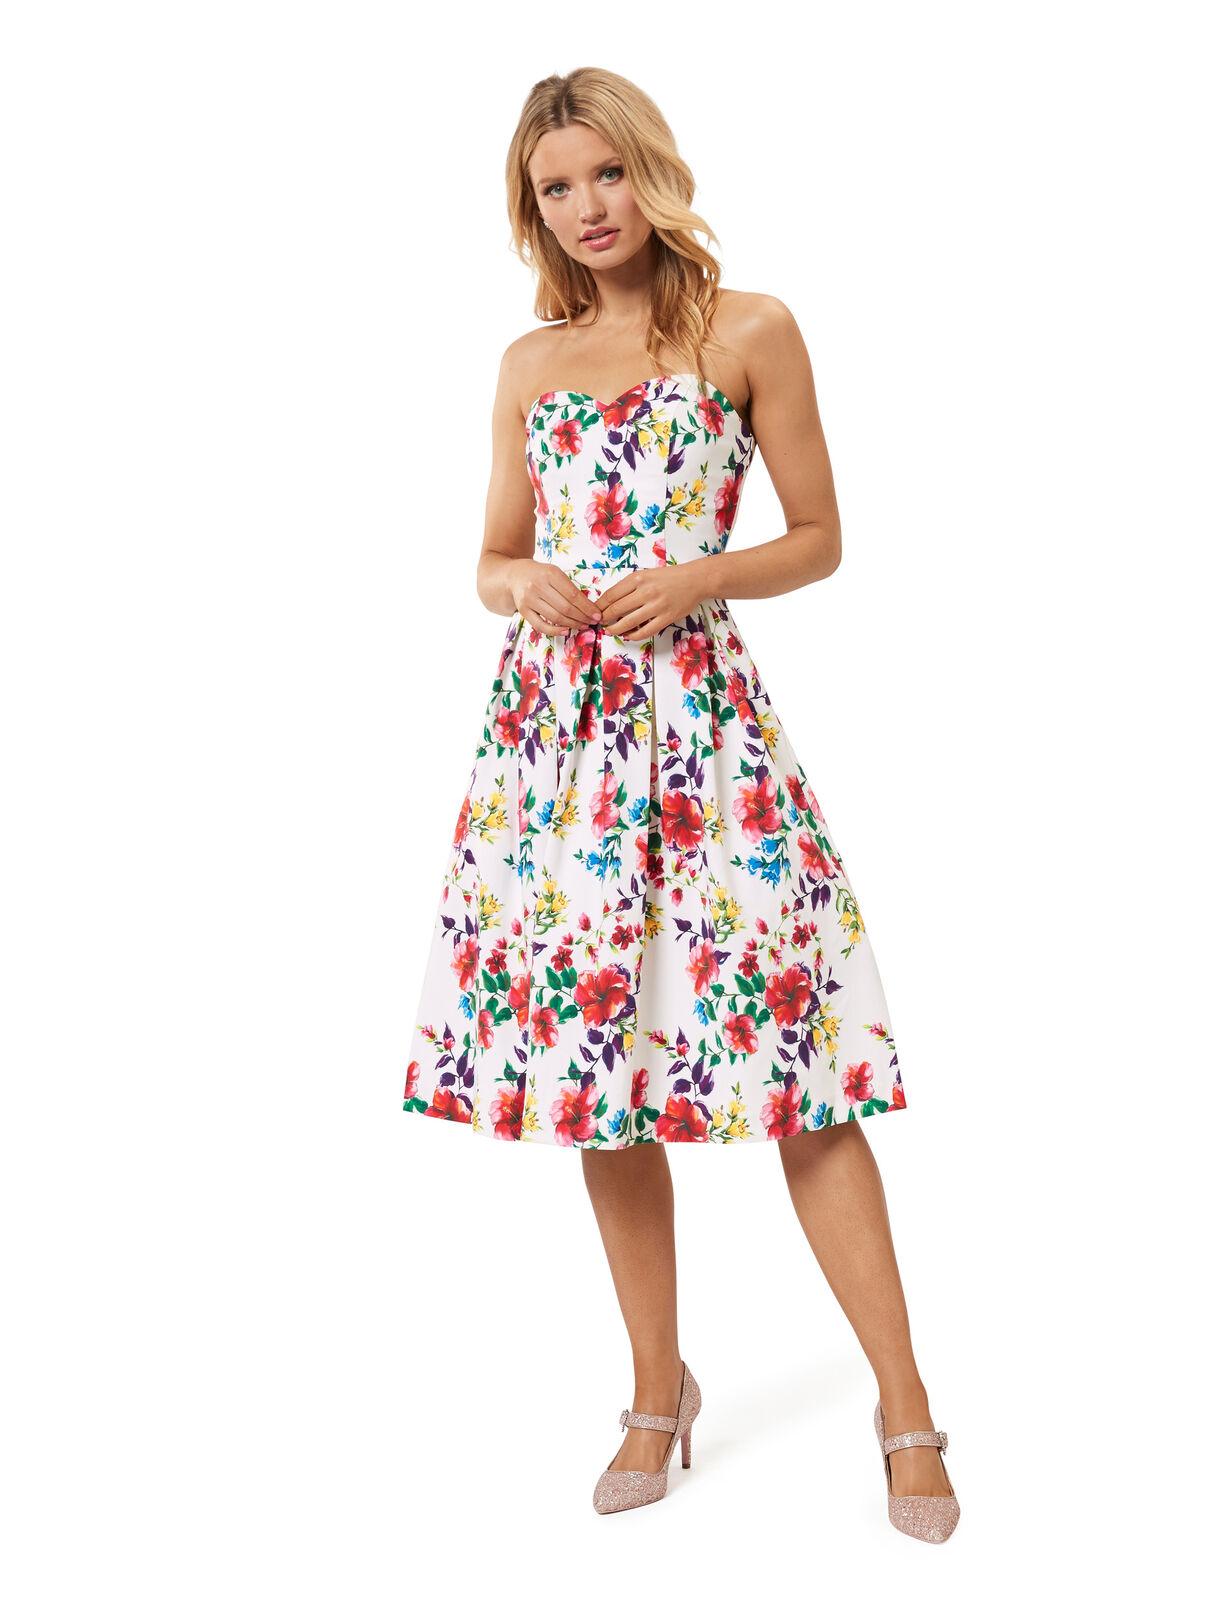 POP DRESS | Dresses, Fashion, Black dress